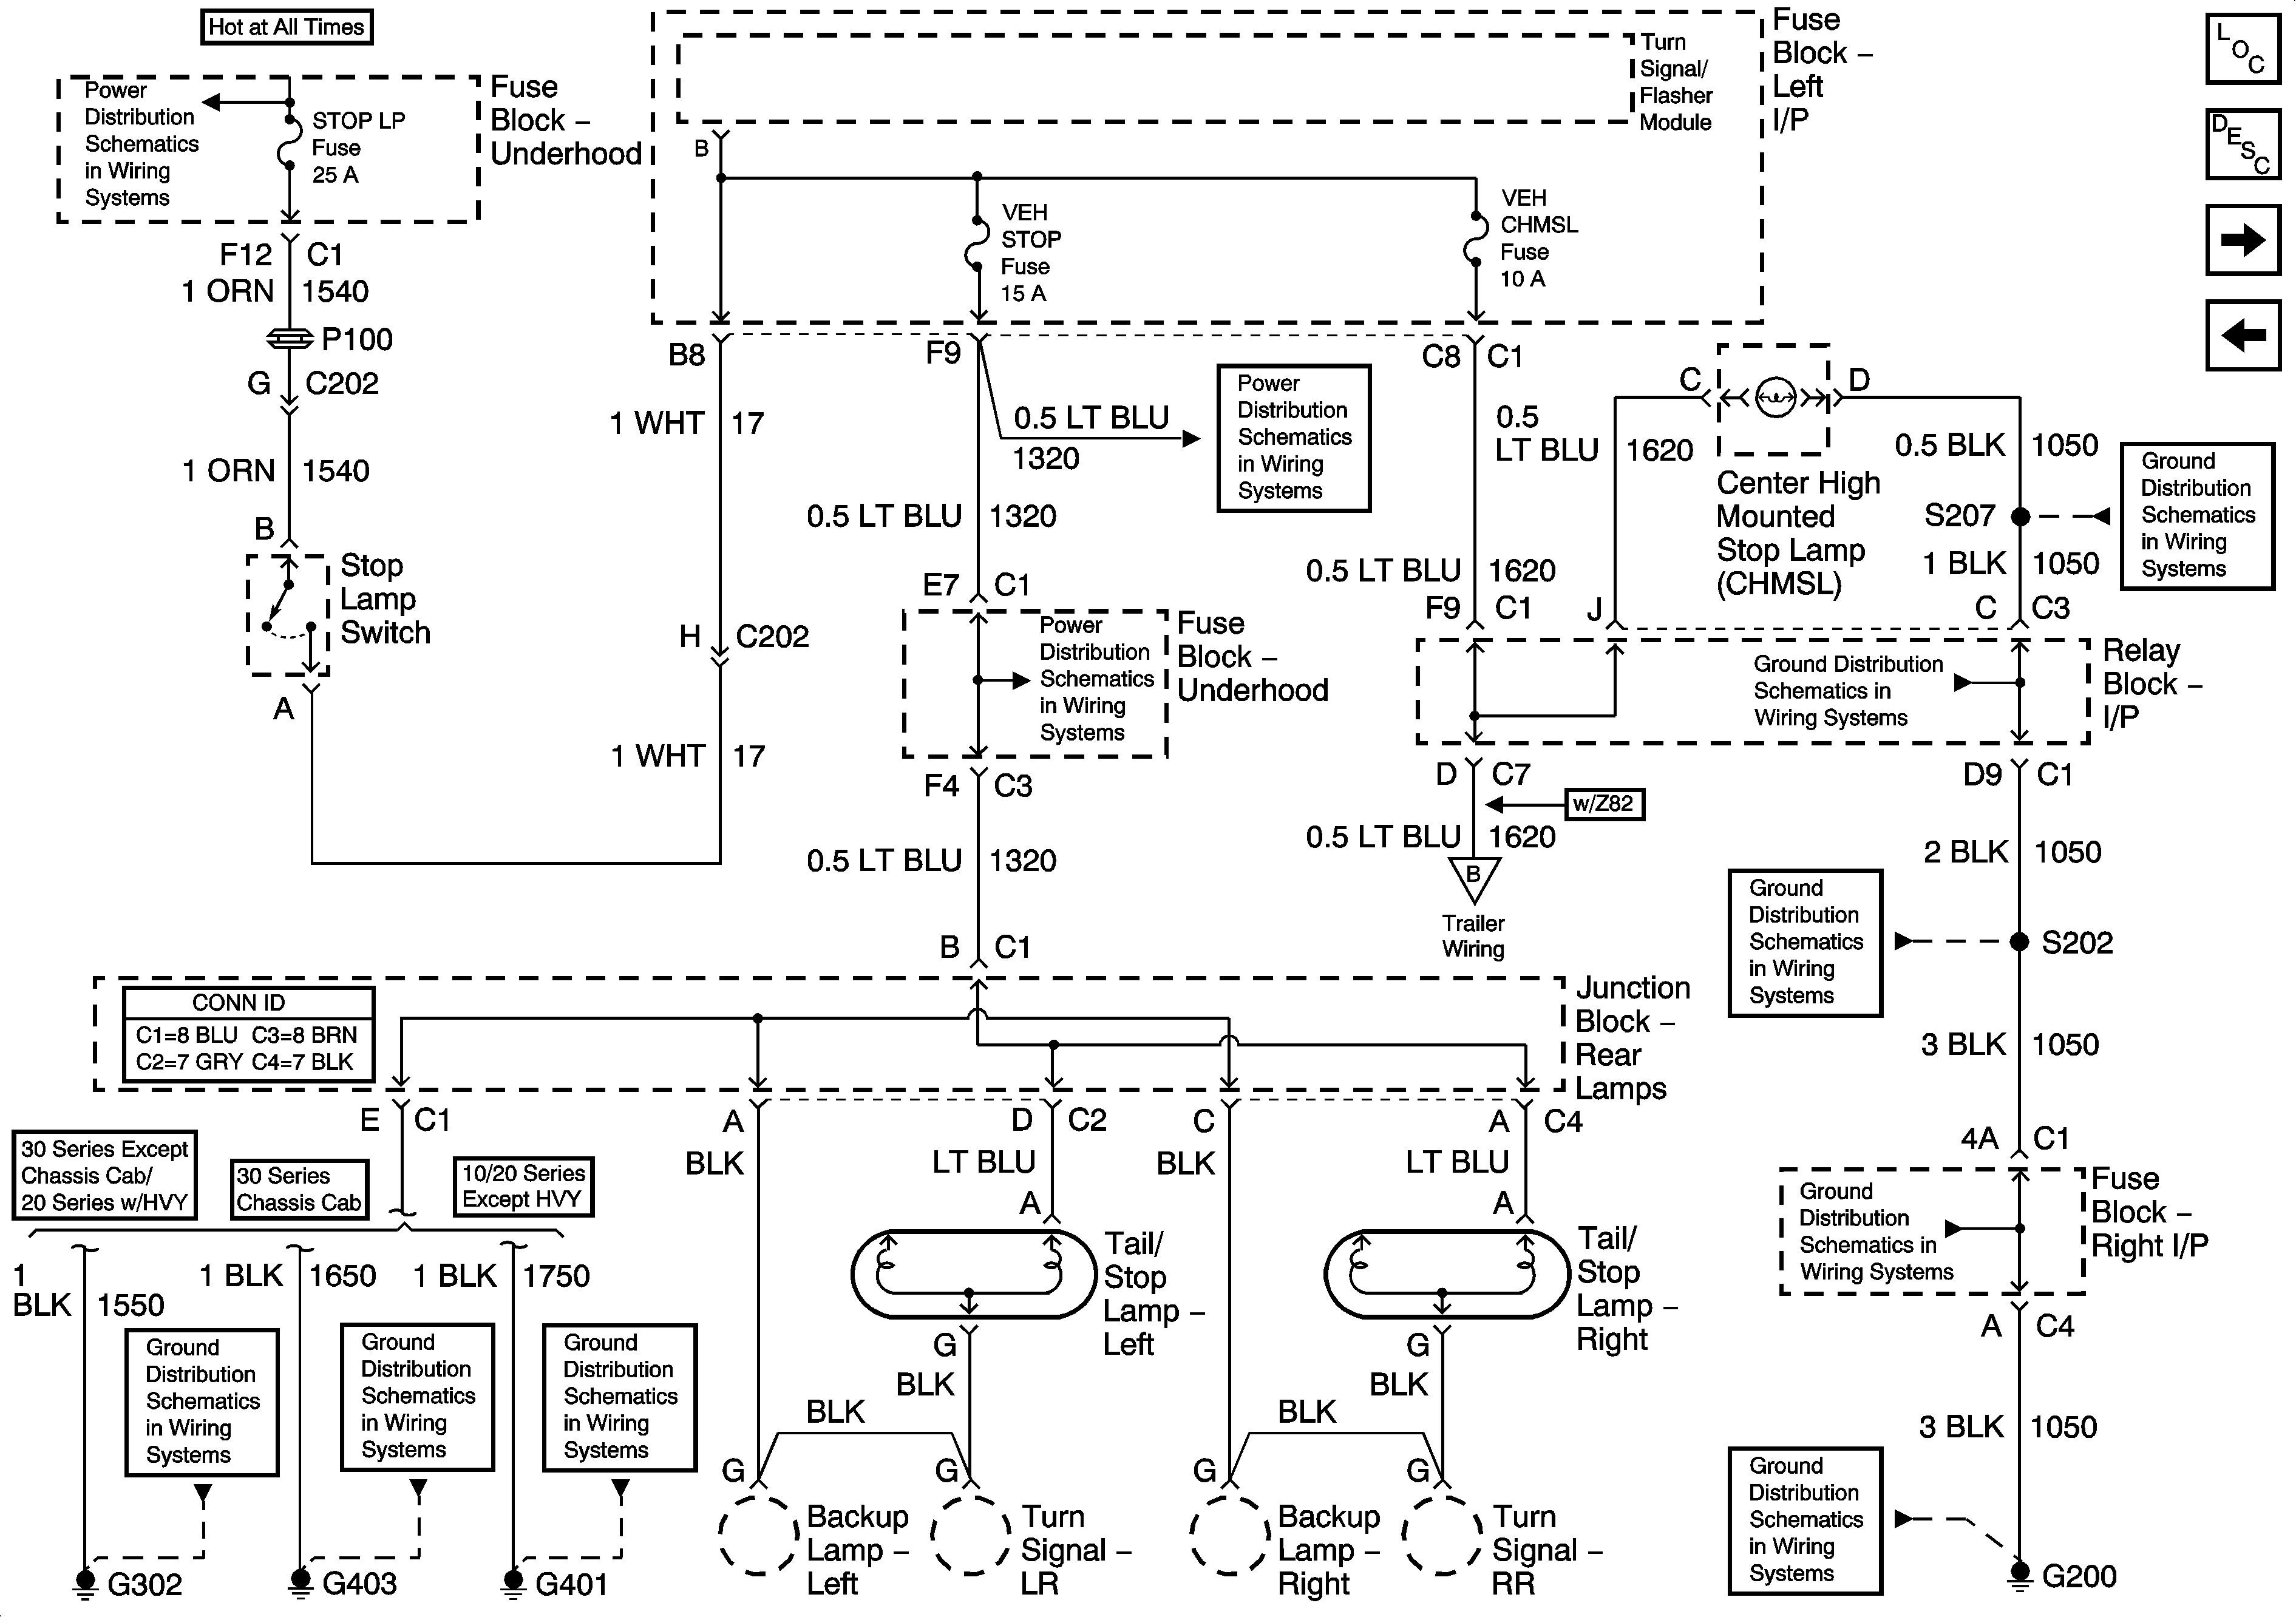 2000 chevy silverado trailer wiring diagram color code how a freezer works gallery